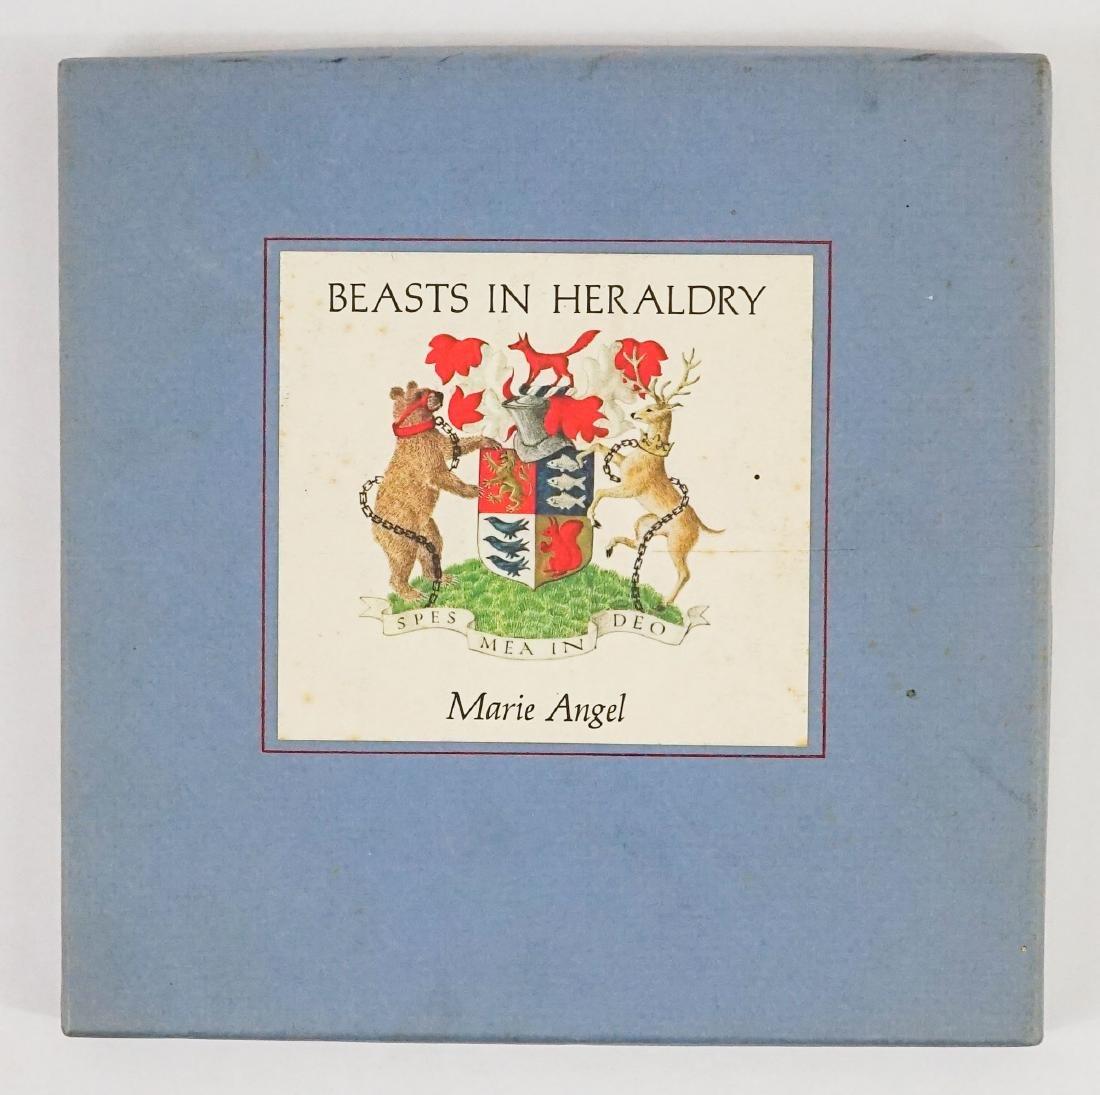 Beasts in Heraldry by Marie Angel 1974